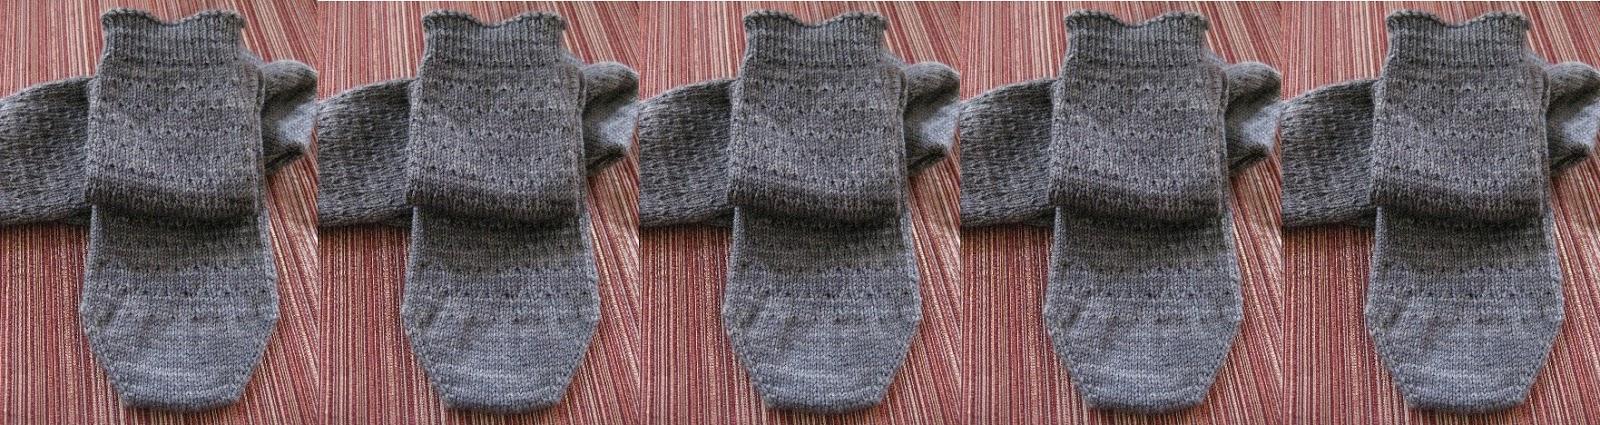 My Socks Syncopation Socks